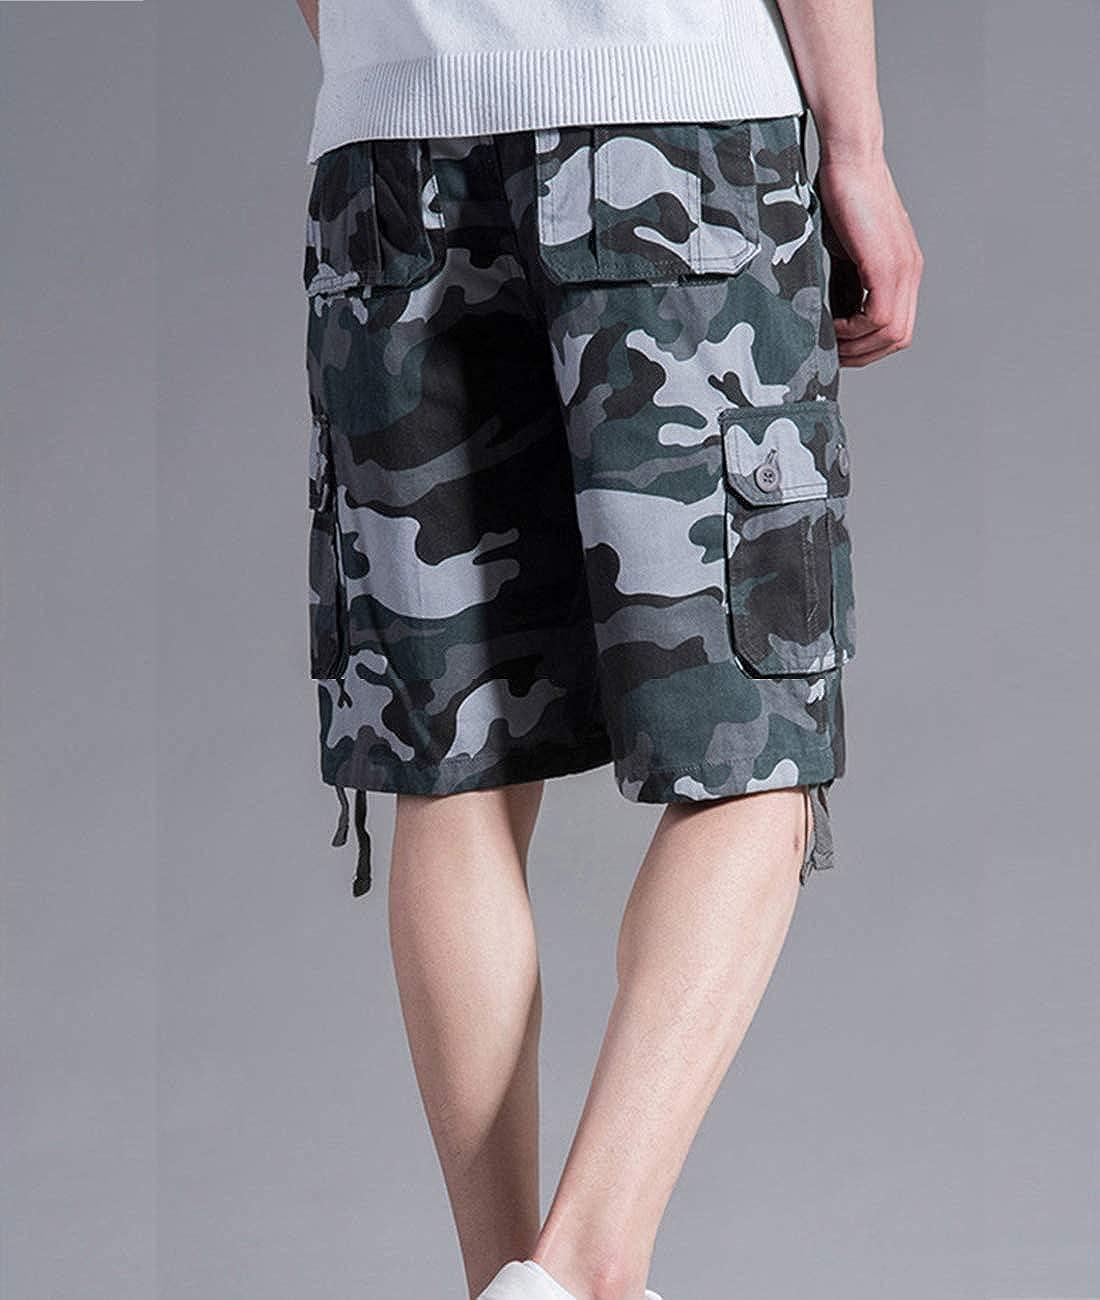 APTRO Mens Short Cargo Shorts Summer Black Cotton Dress Camo Casual Shorts Men's Shorts Combat Pants Multi Pocket Knee Length Elastic Shorts Camouflage Blue Dk01